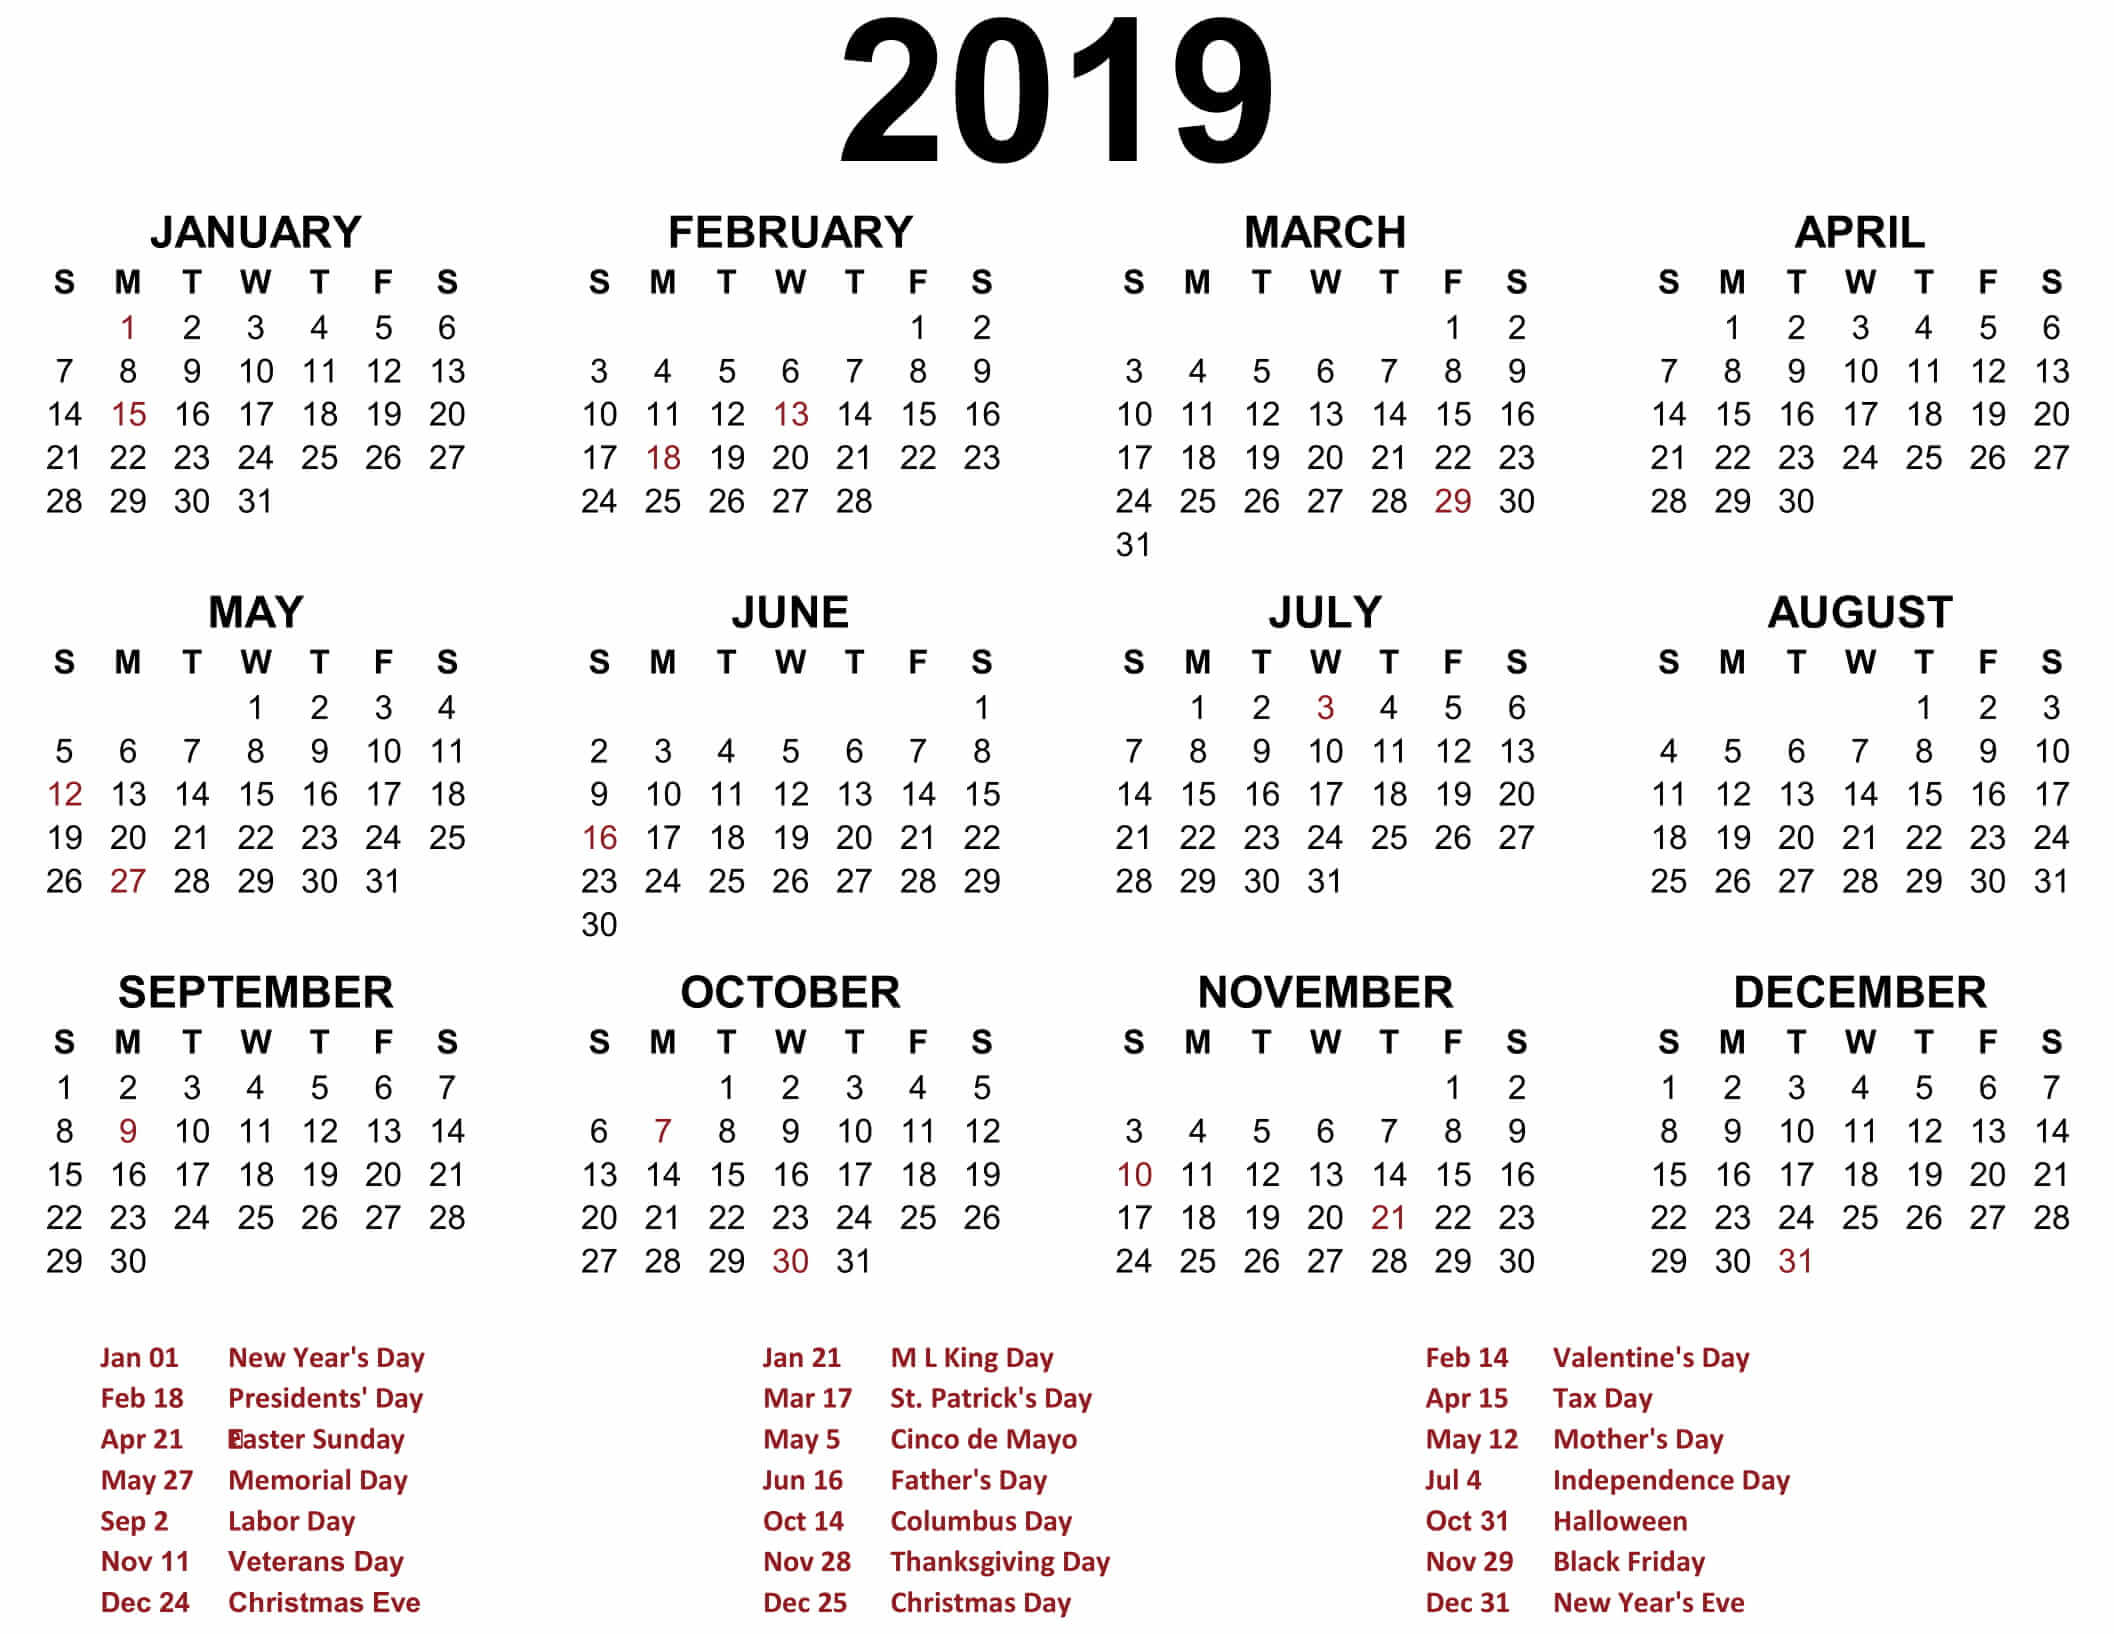 Annual Calendar Template   Annual Calendar Template Free Images At Clker Com Vector Clip